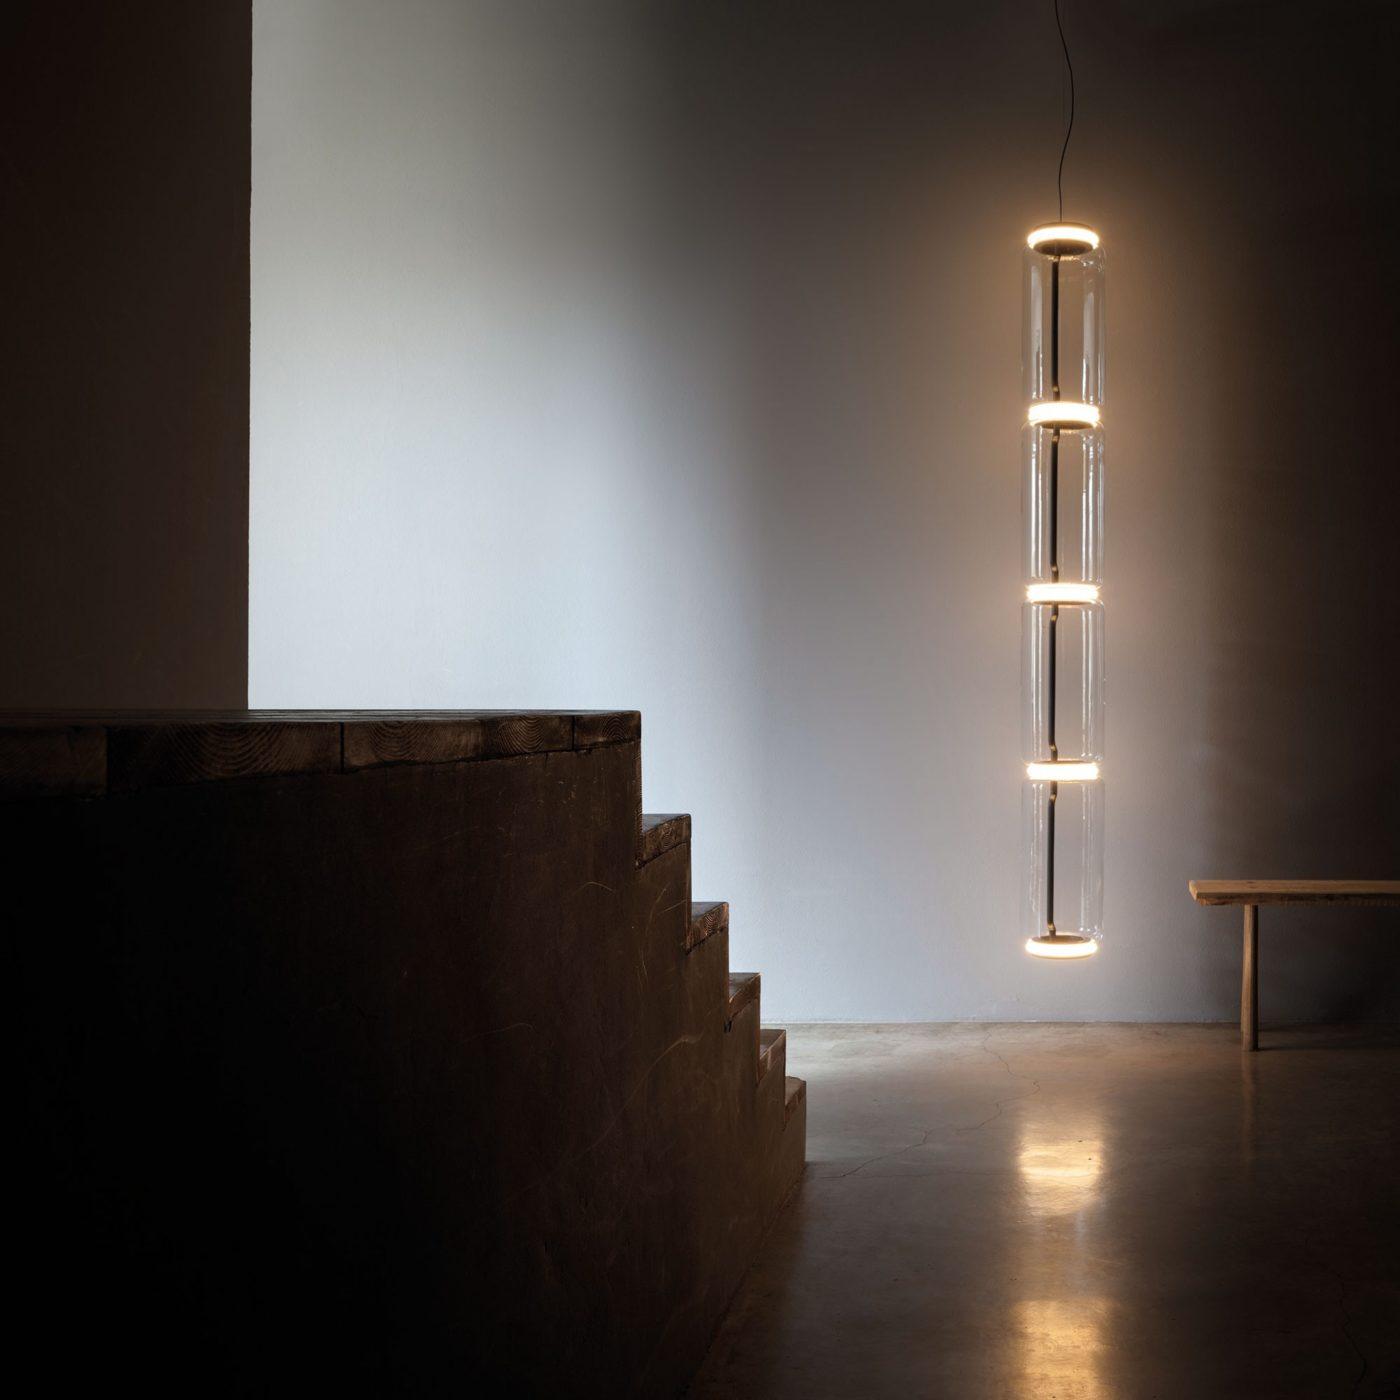 Flos_Noctambule-Low-Cylinder-LED-Pendelleuchte_2000x2000-ID1972439-dc52a84297acf43f8dfcfdbbdac4478a